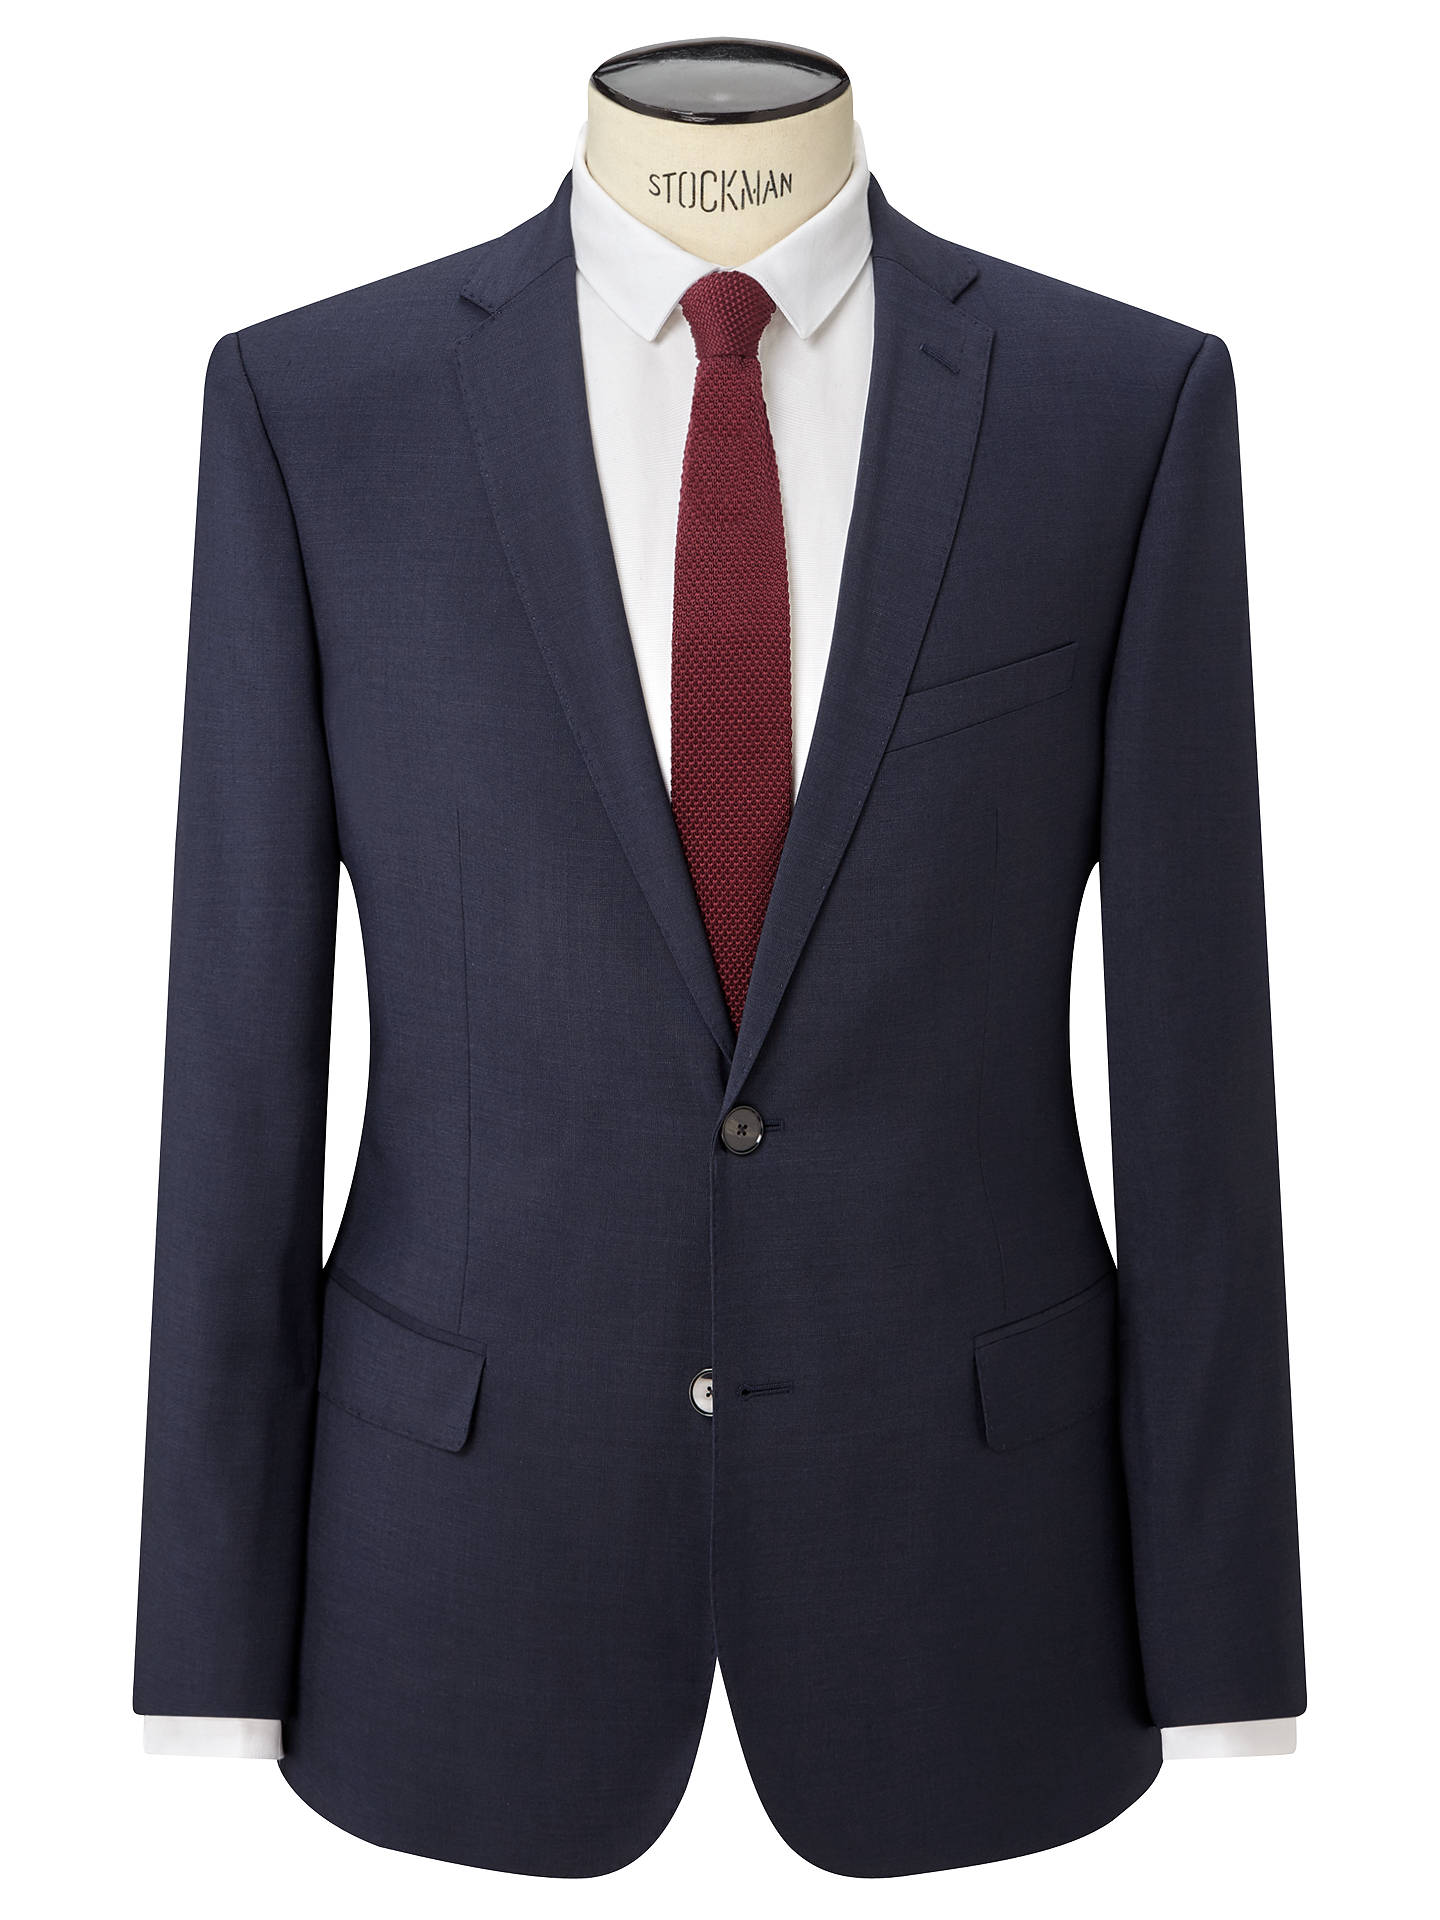 "John Lewis Kin Crepe Slim Fit Notch Lapel Suit Jacket Teal 36"" Regular RRP £119"